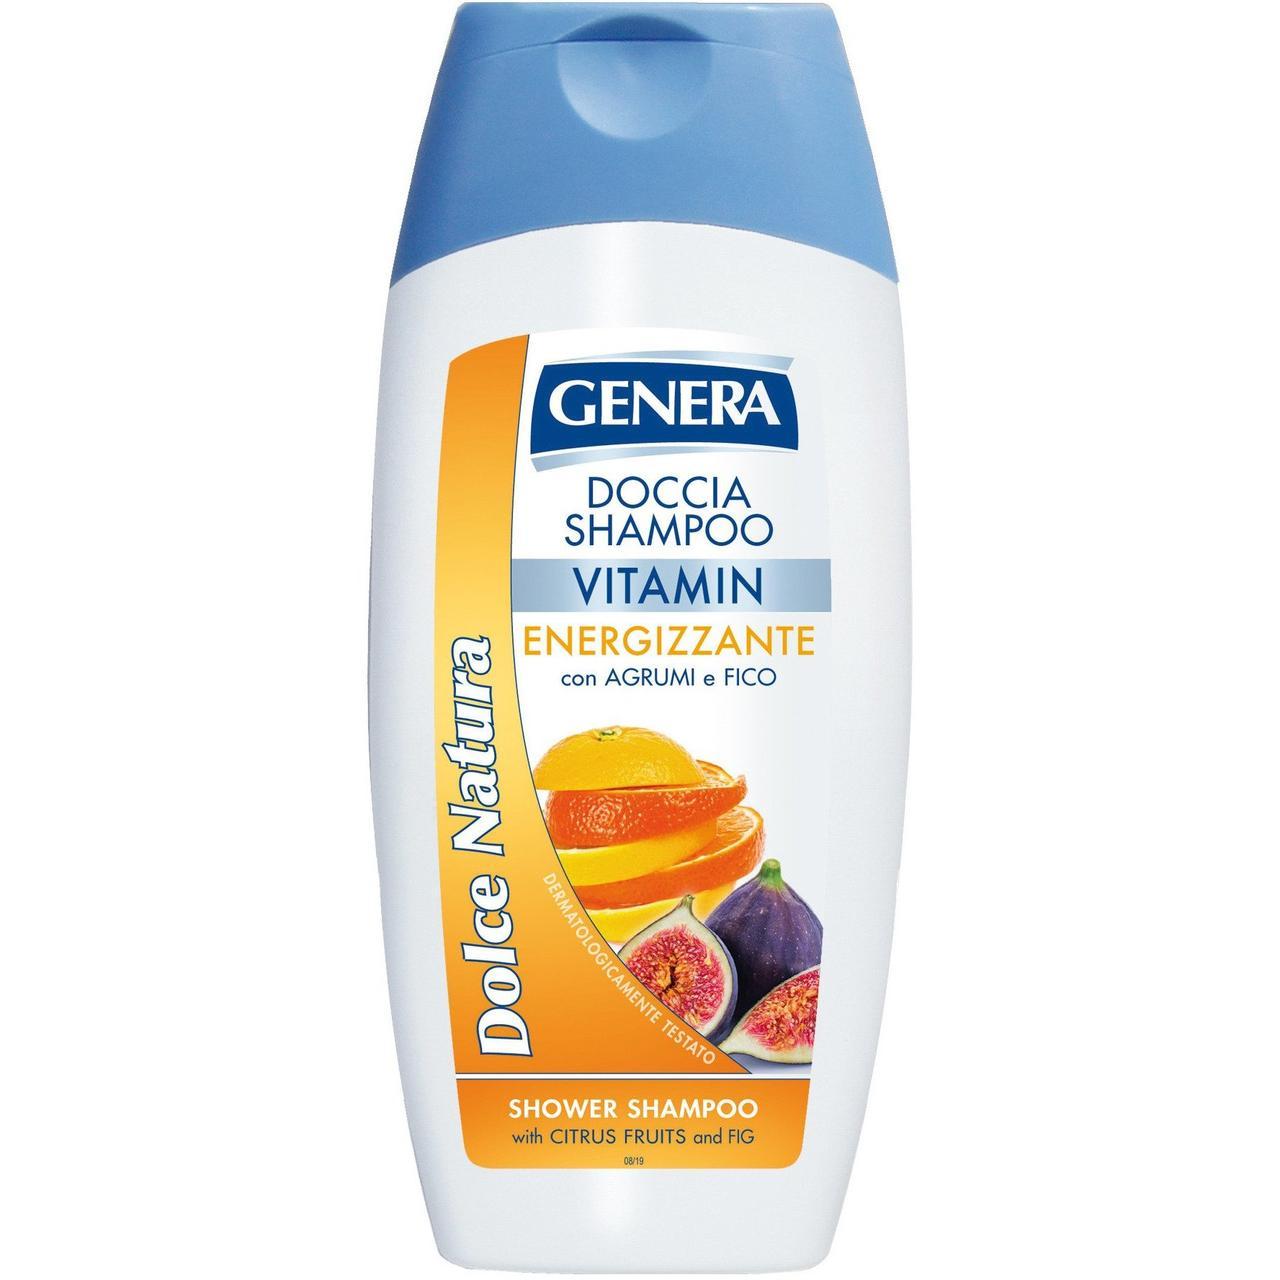 GENERA DOLCE NATURA Vitamin Шампунь для волос Цитрус и Инжир 300мл